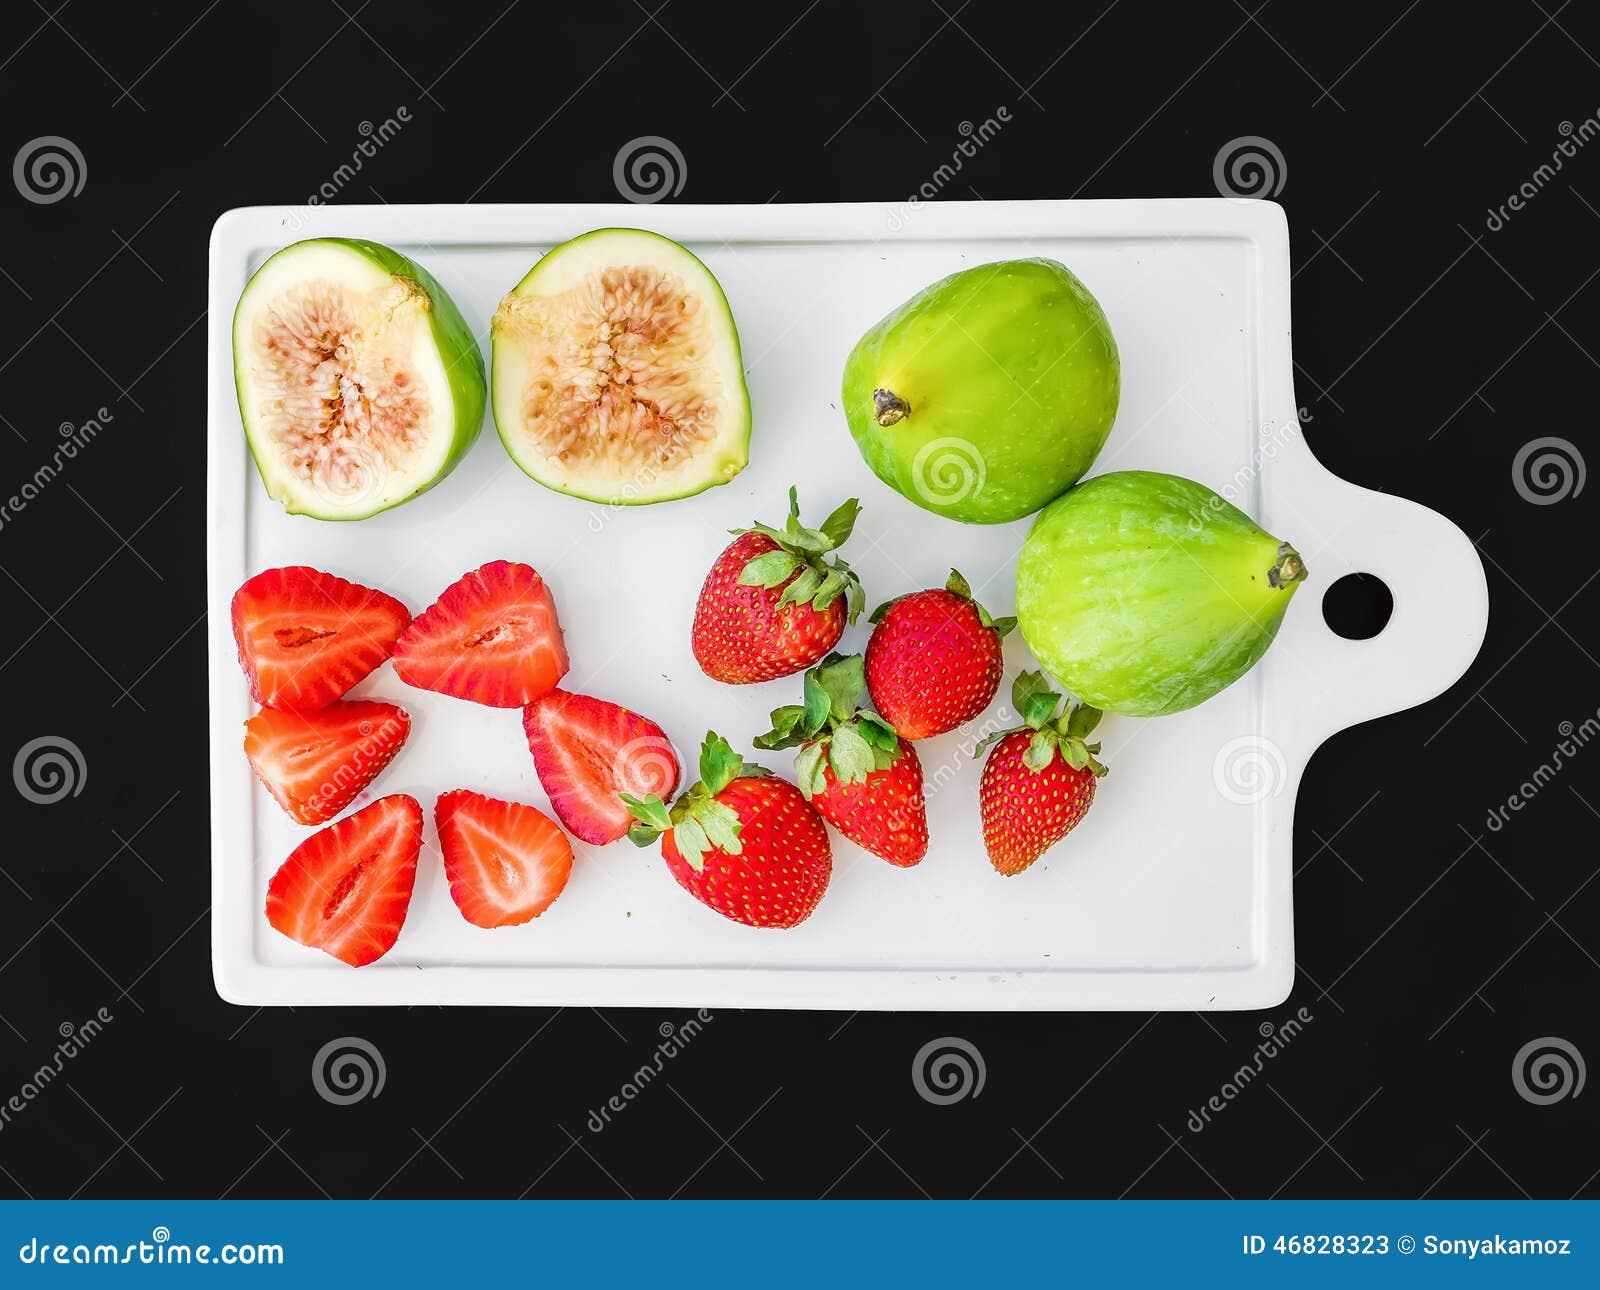 a set of fresh fruit on a white ceramic cutting board stock photo, Kitchen design